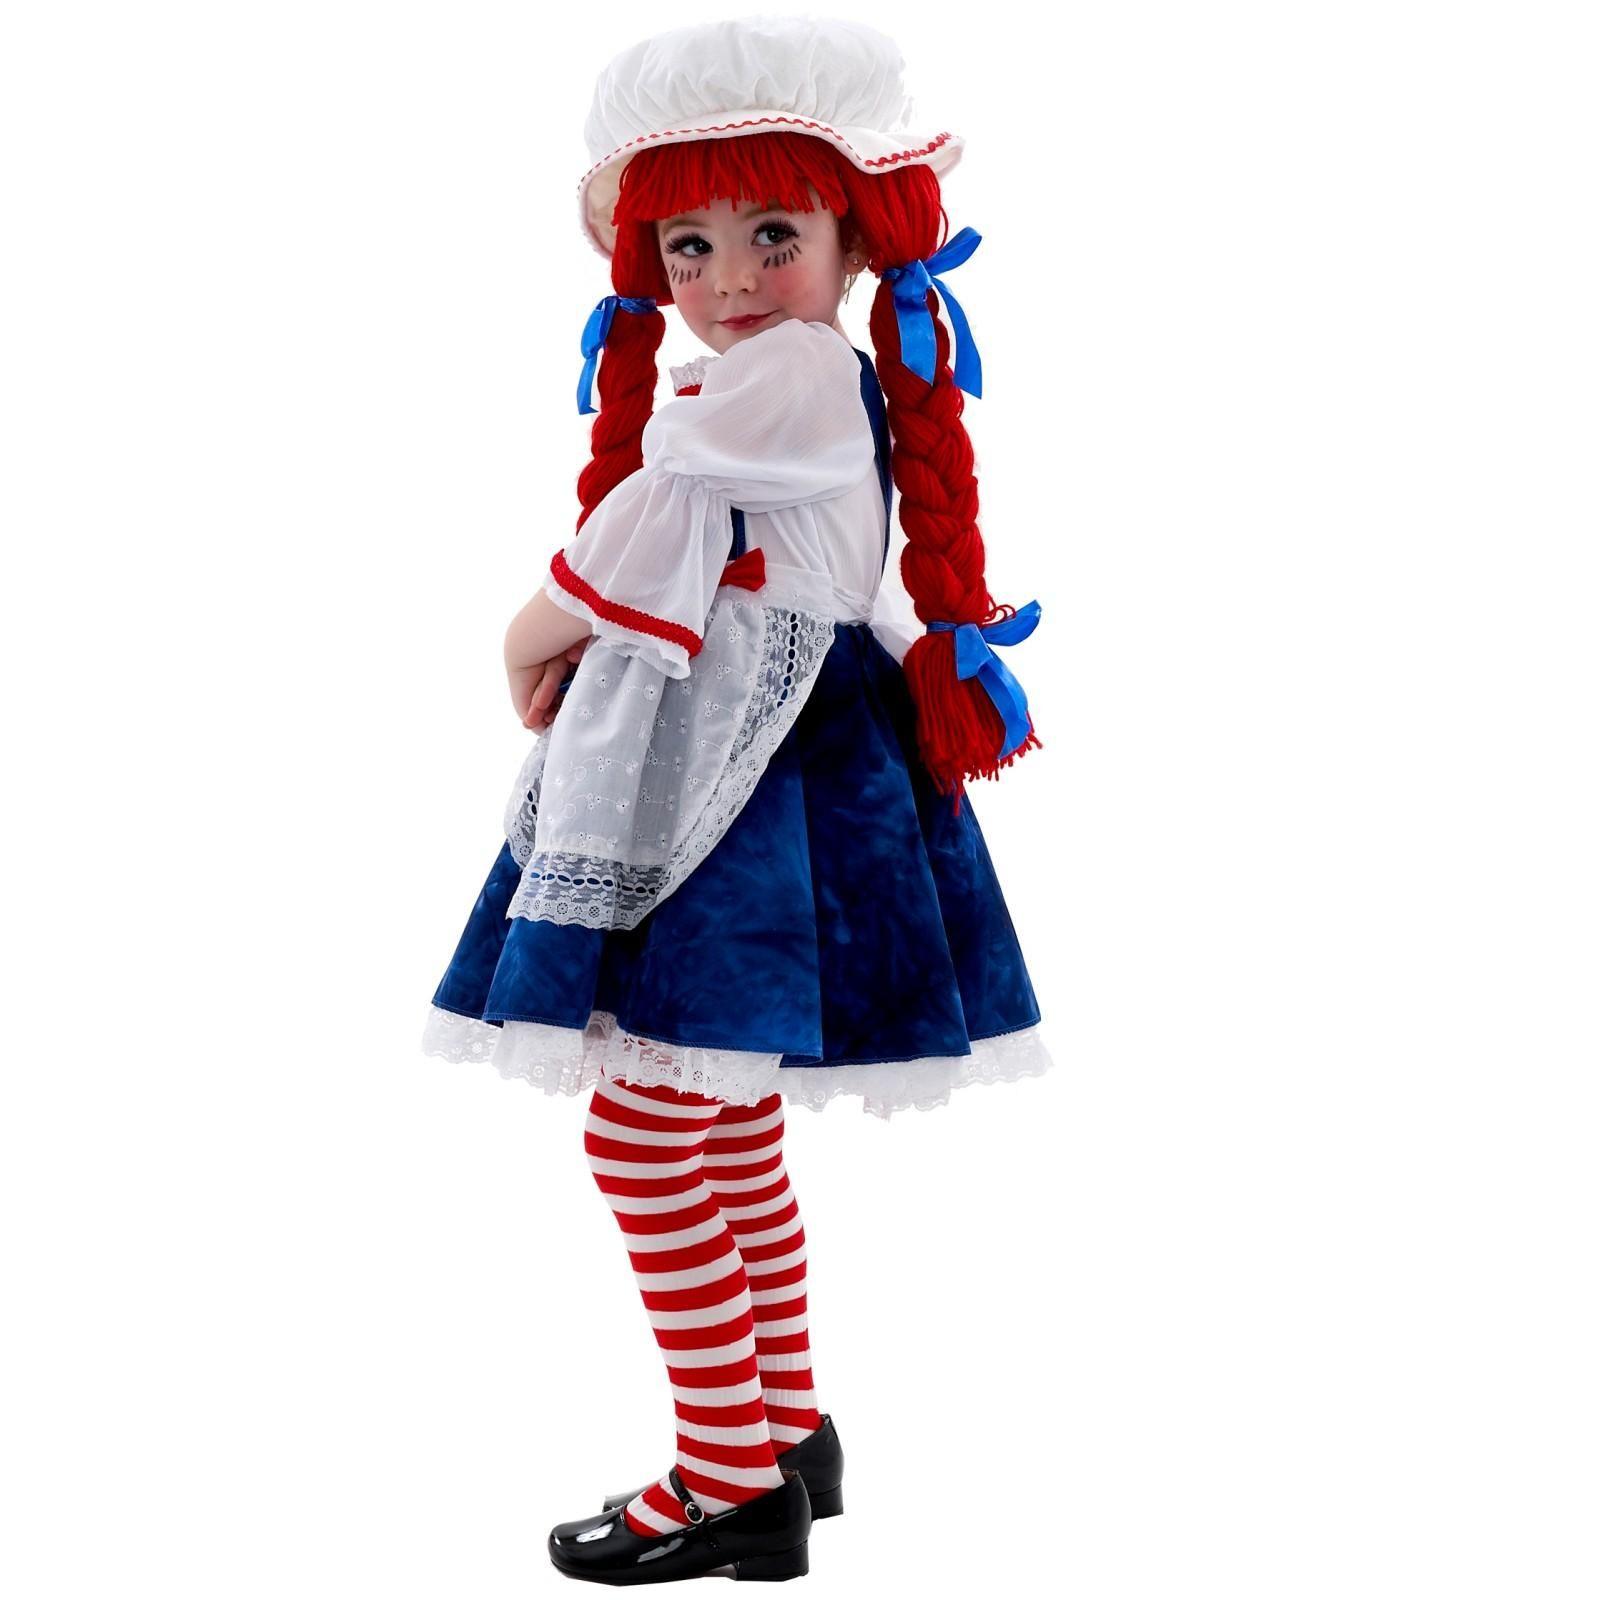 muñeca de trapo Muñecas de trapo, Niños, Disfraces